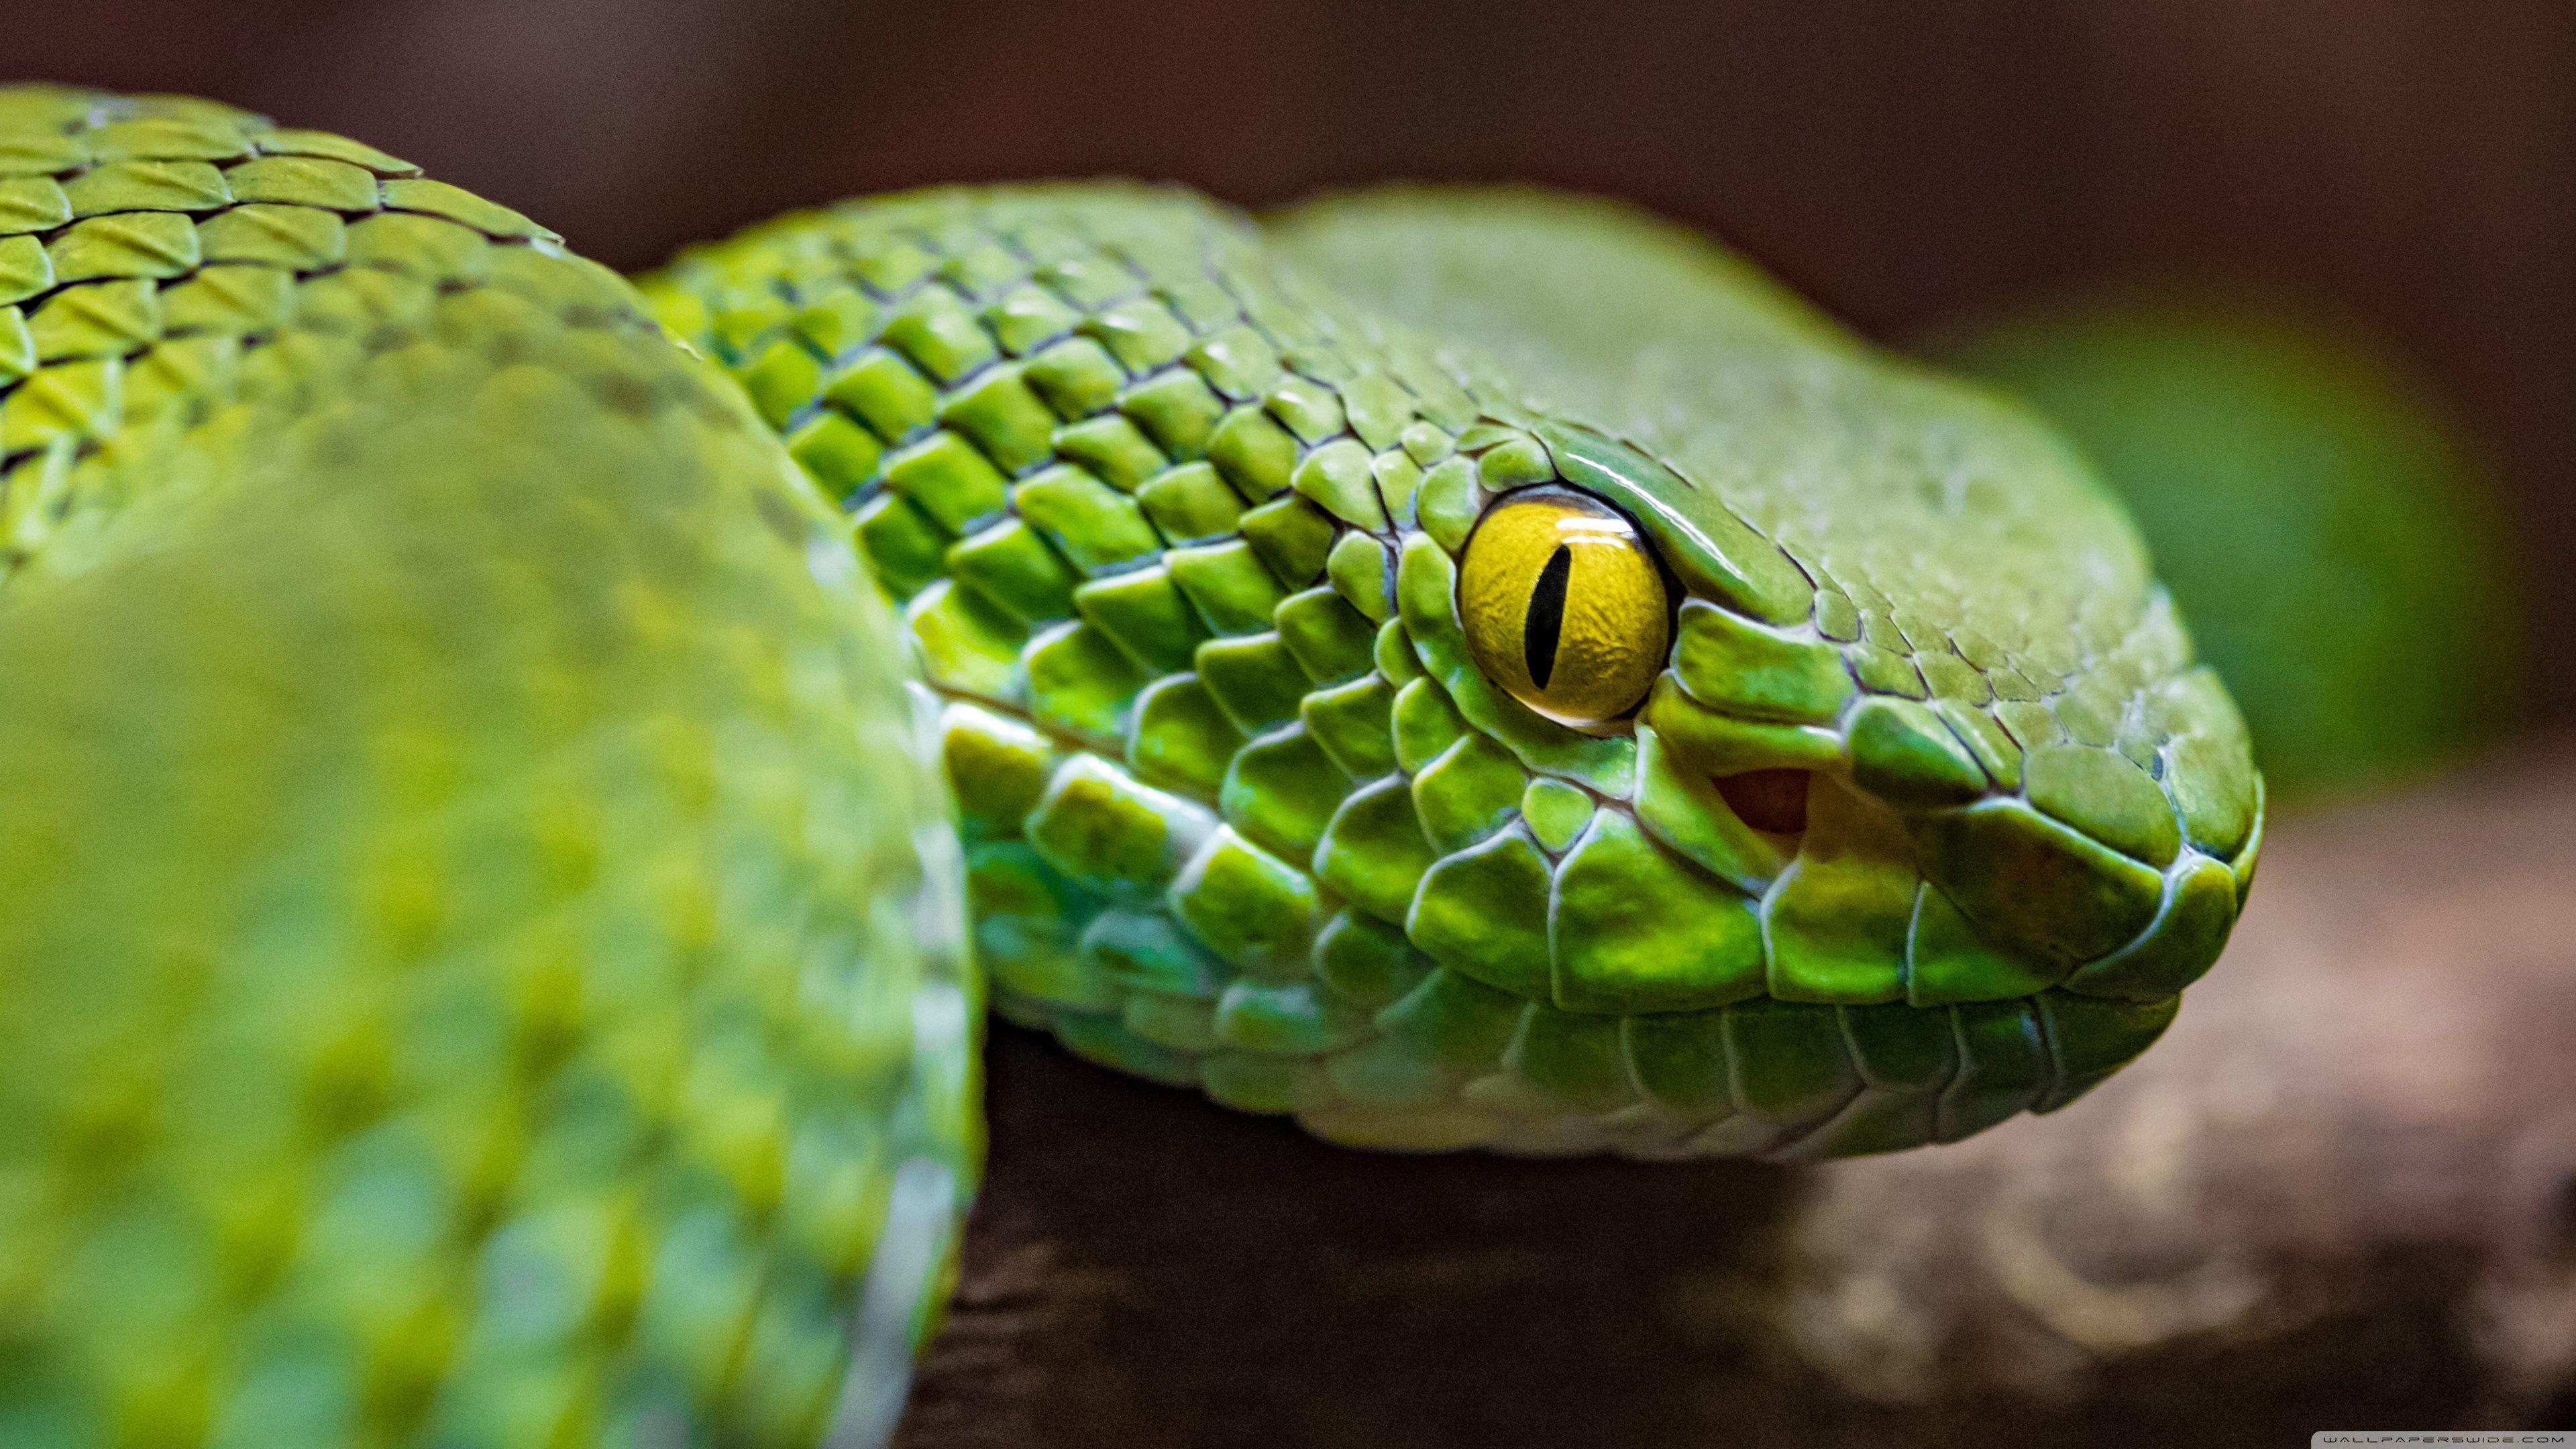 Snake 4k ultra hd wallpapers top free snake 4k ultra hd - Green snake hd wallpaper ...